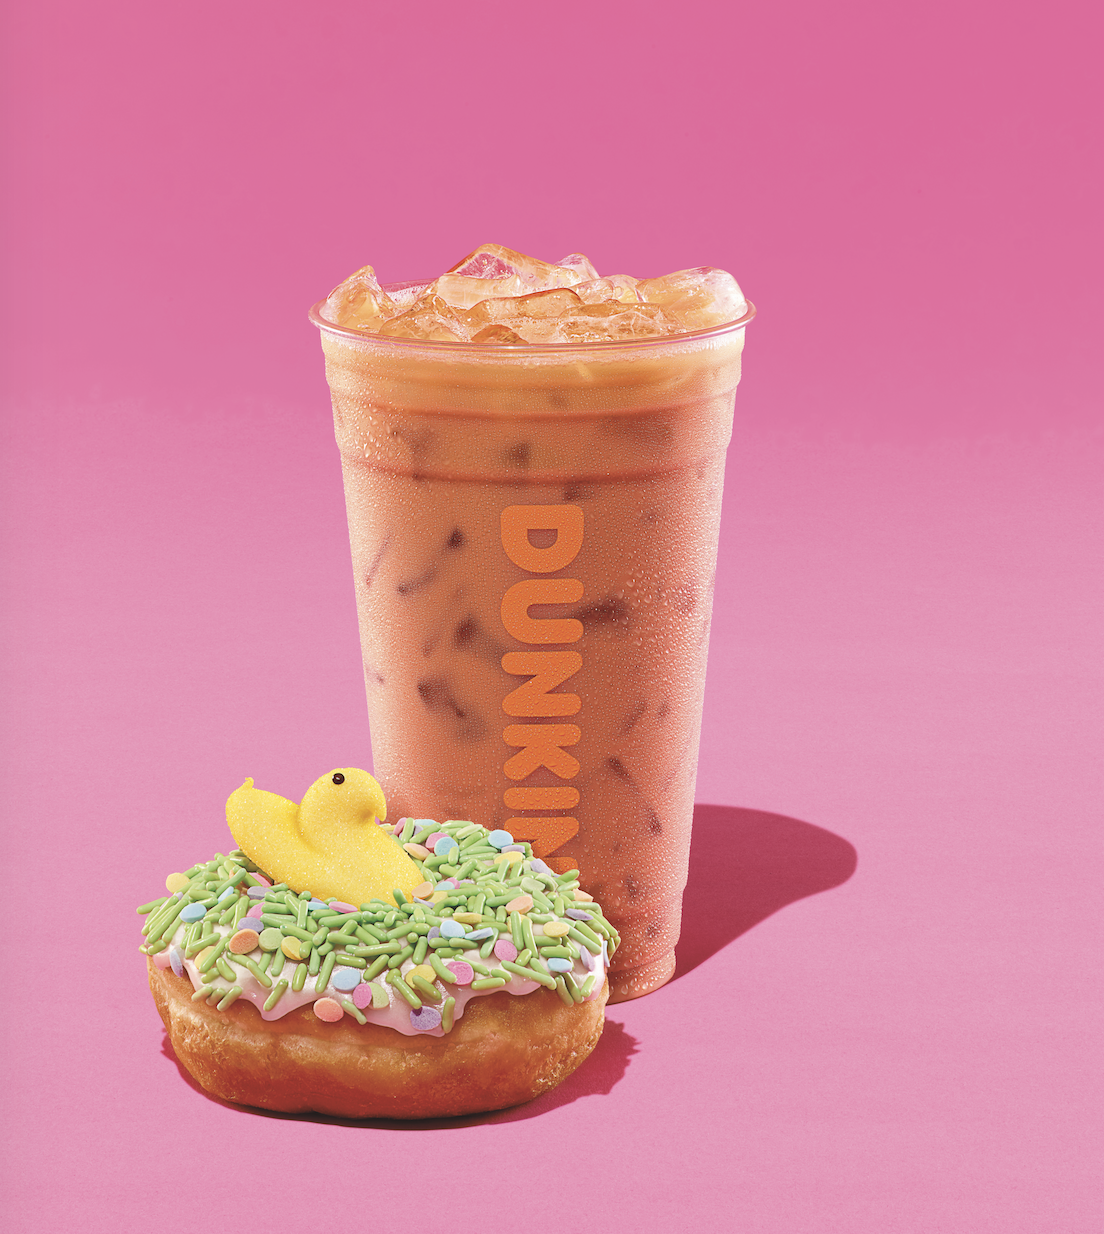 Dunkin's New Coffee Tastes EXACTLY Like A Peeps